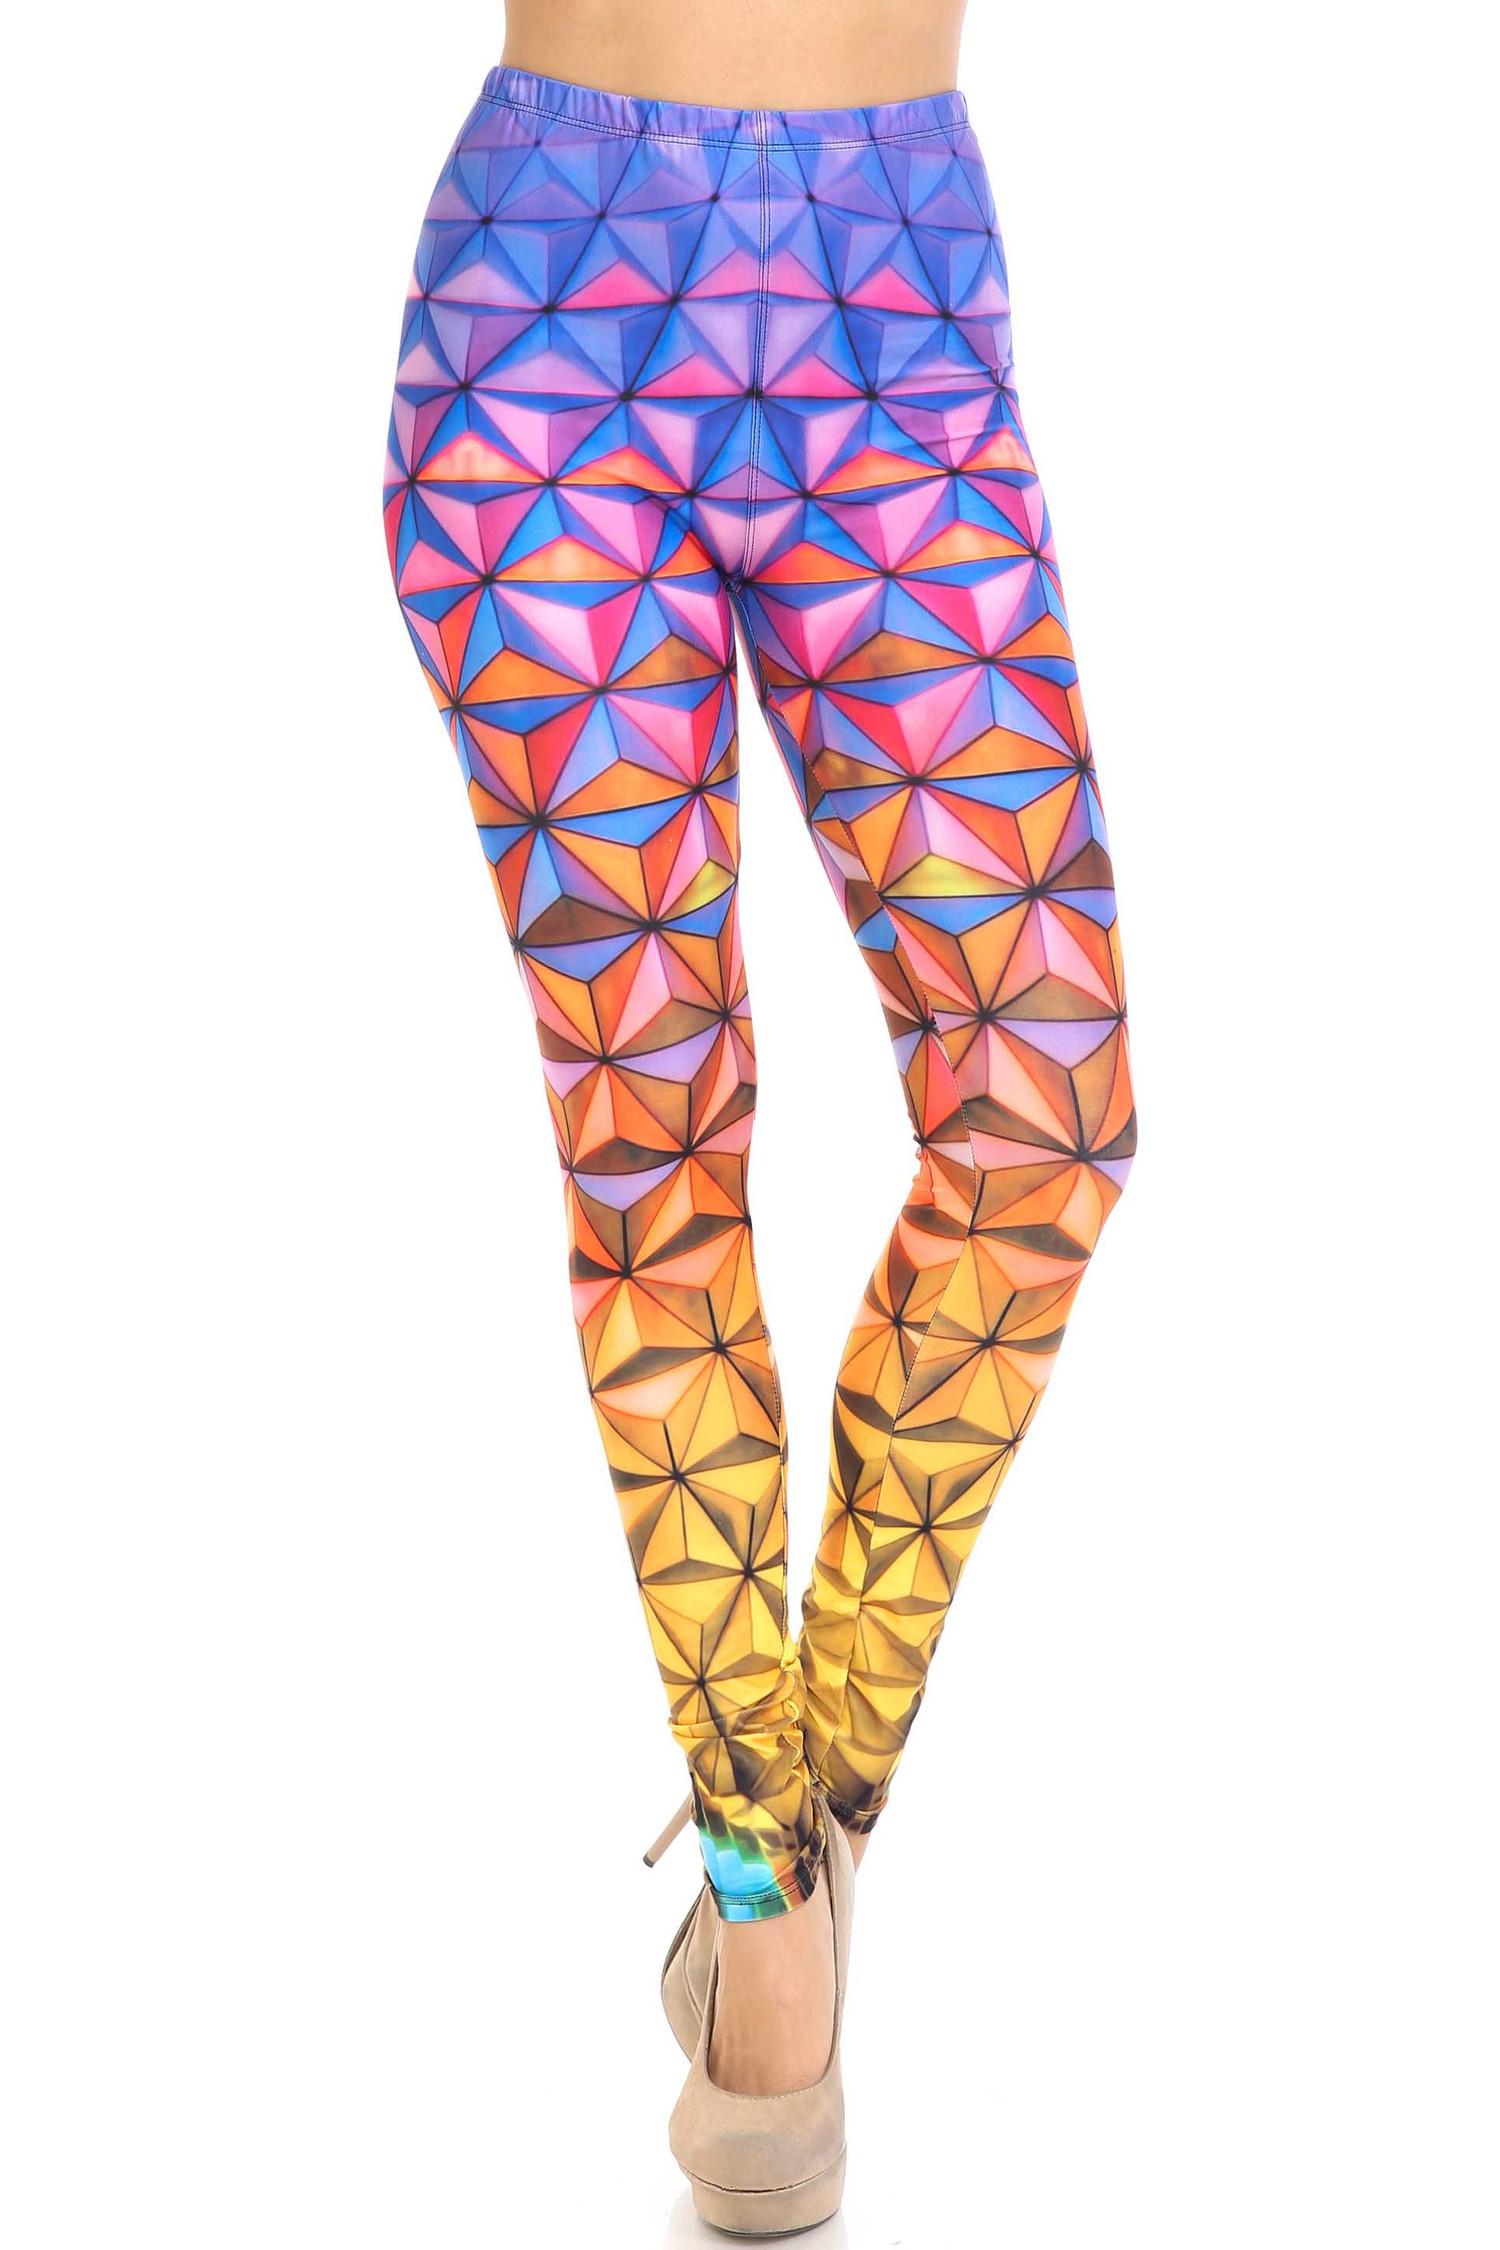 Creamy Soft Ombre Epcot Extra Plus Size Leggings - 3X-5X - USA Fashion™